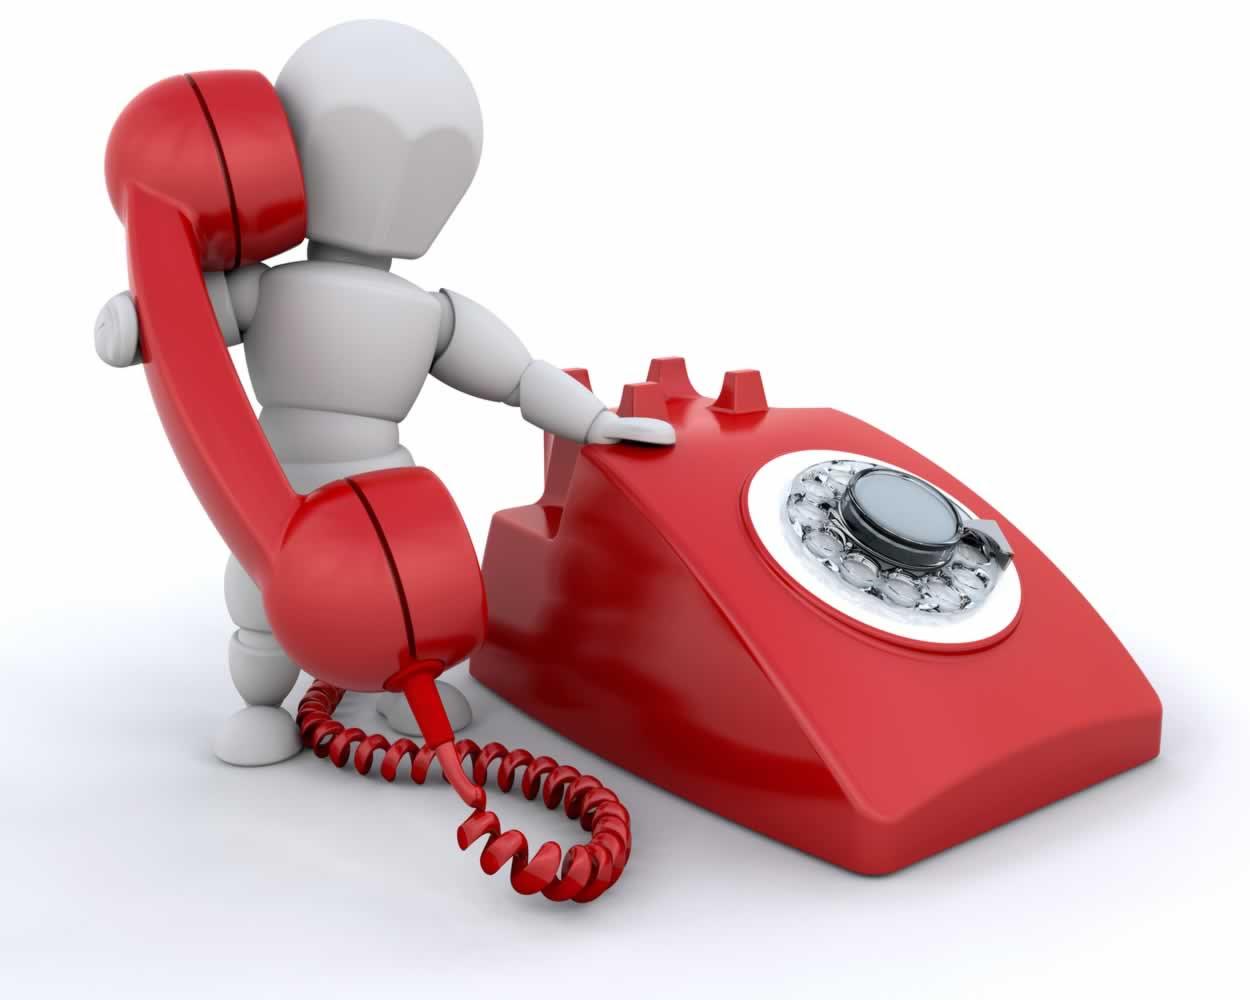 telepon darurat,emergency call,penting